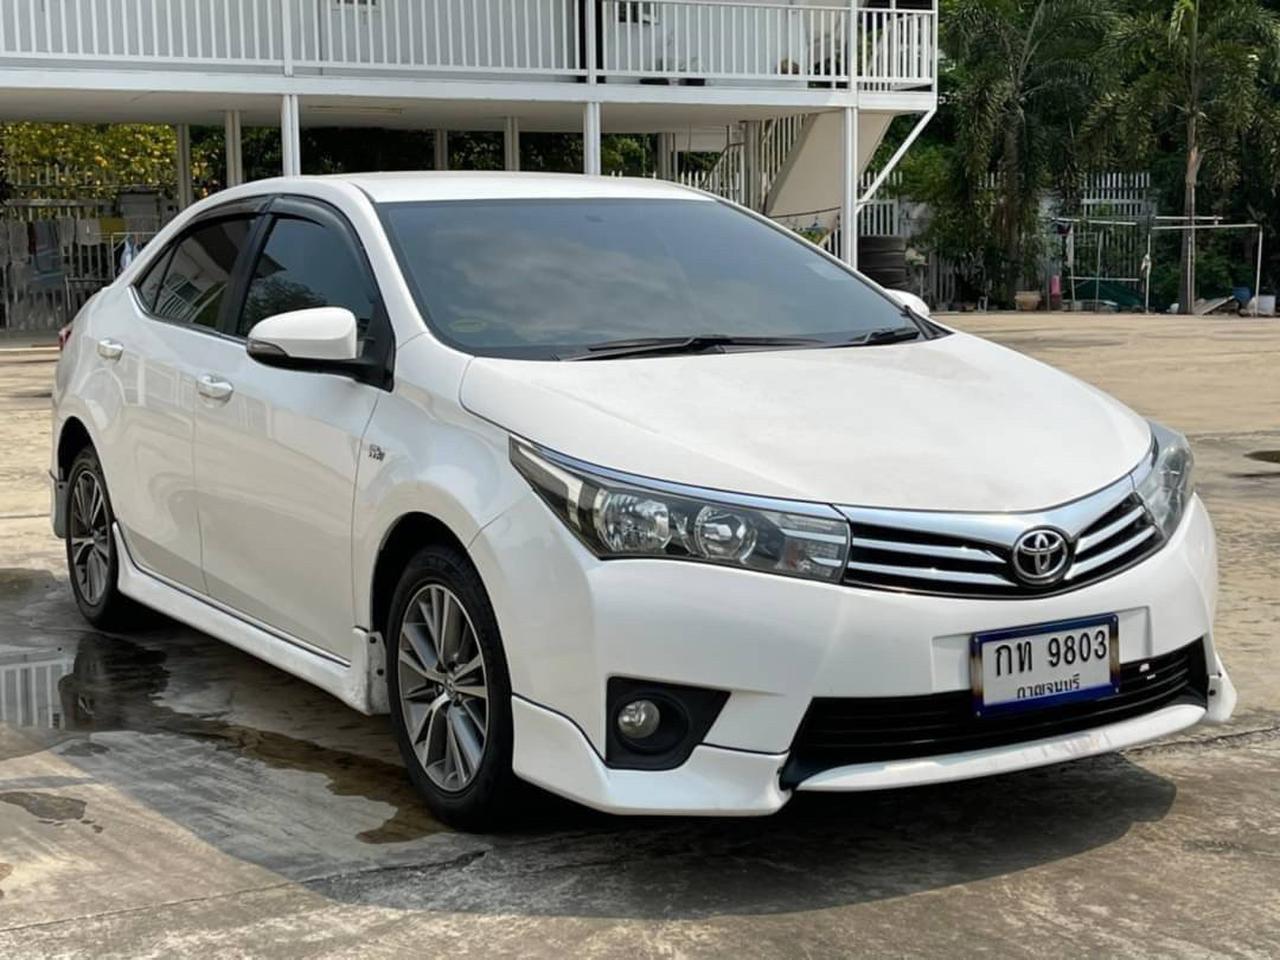 62 Toyota Altis 1.6 E (CNG) ปี 2014 สีขาว เกียร์ออโต้ รูปที่ 2